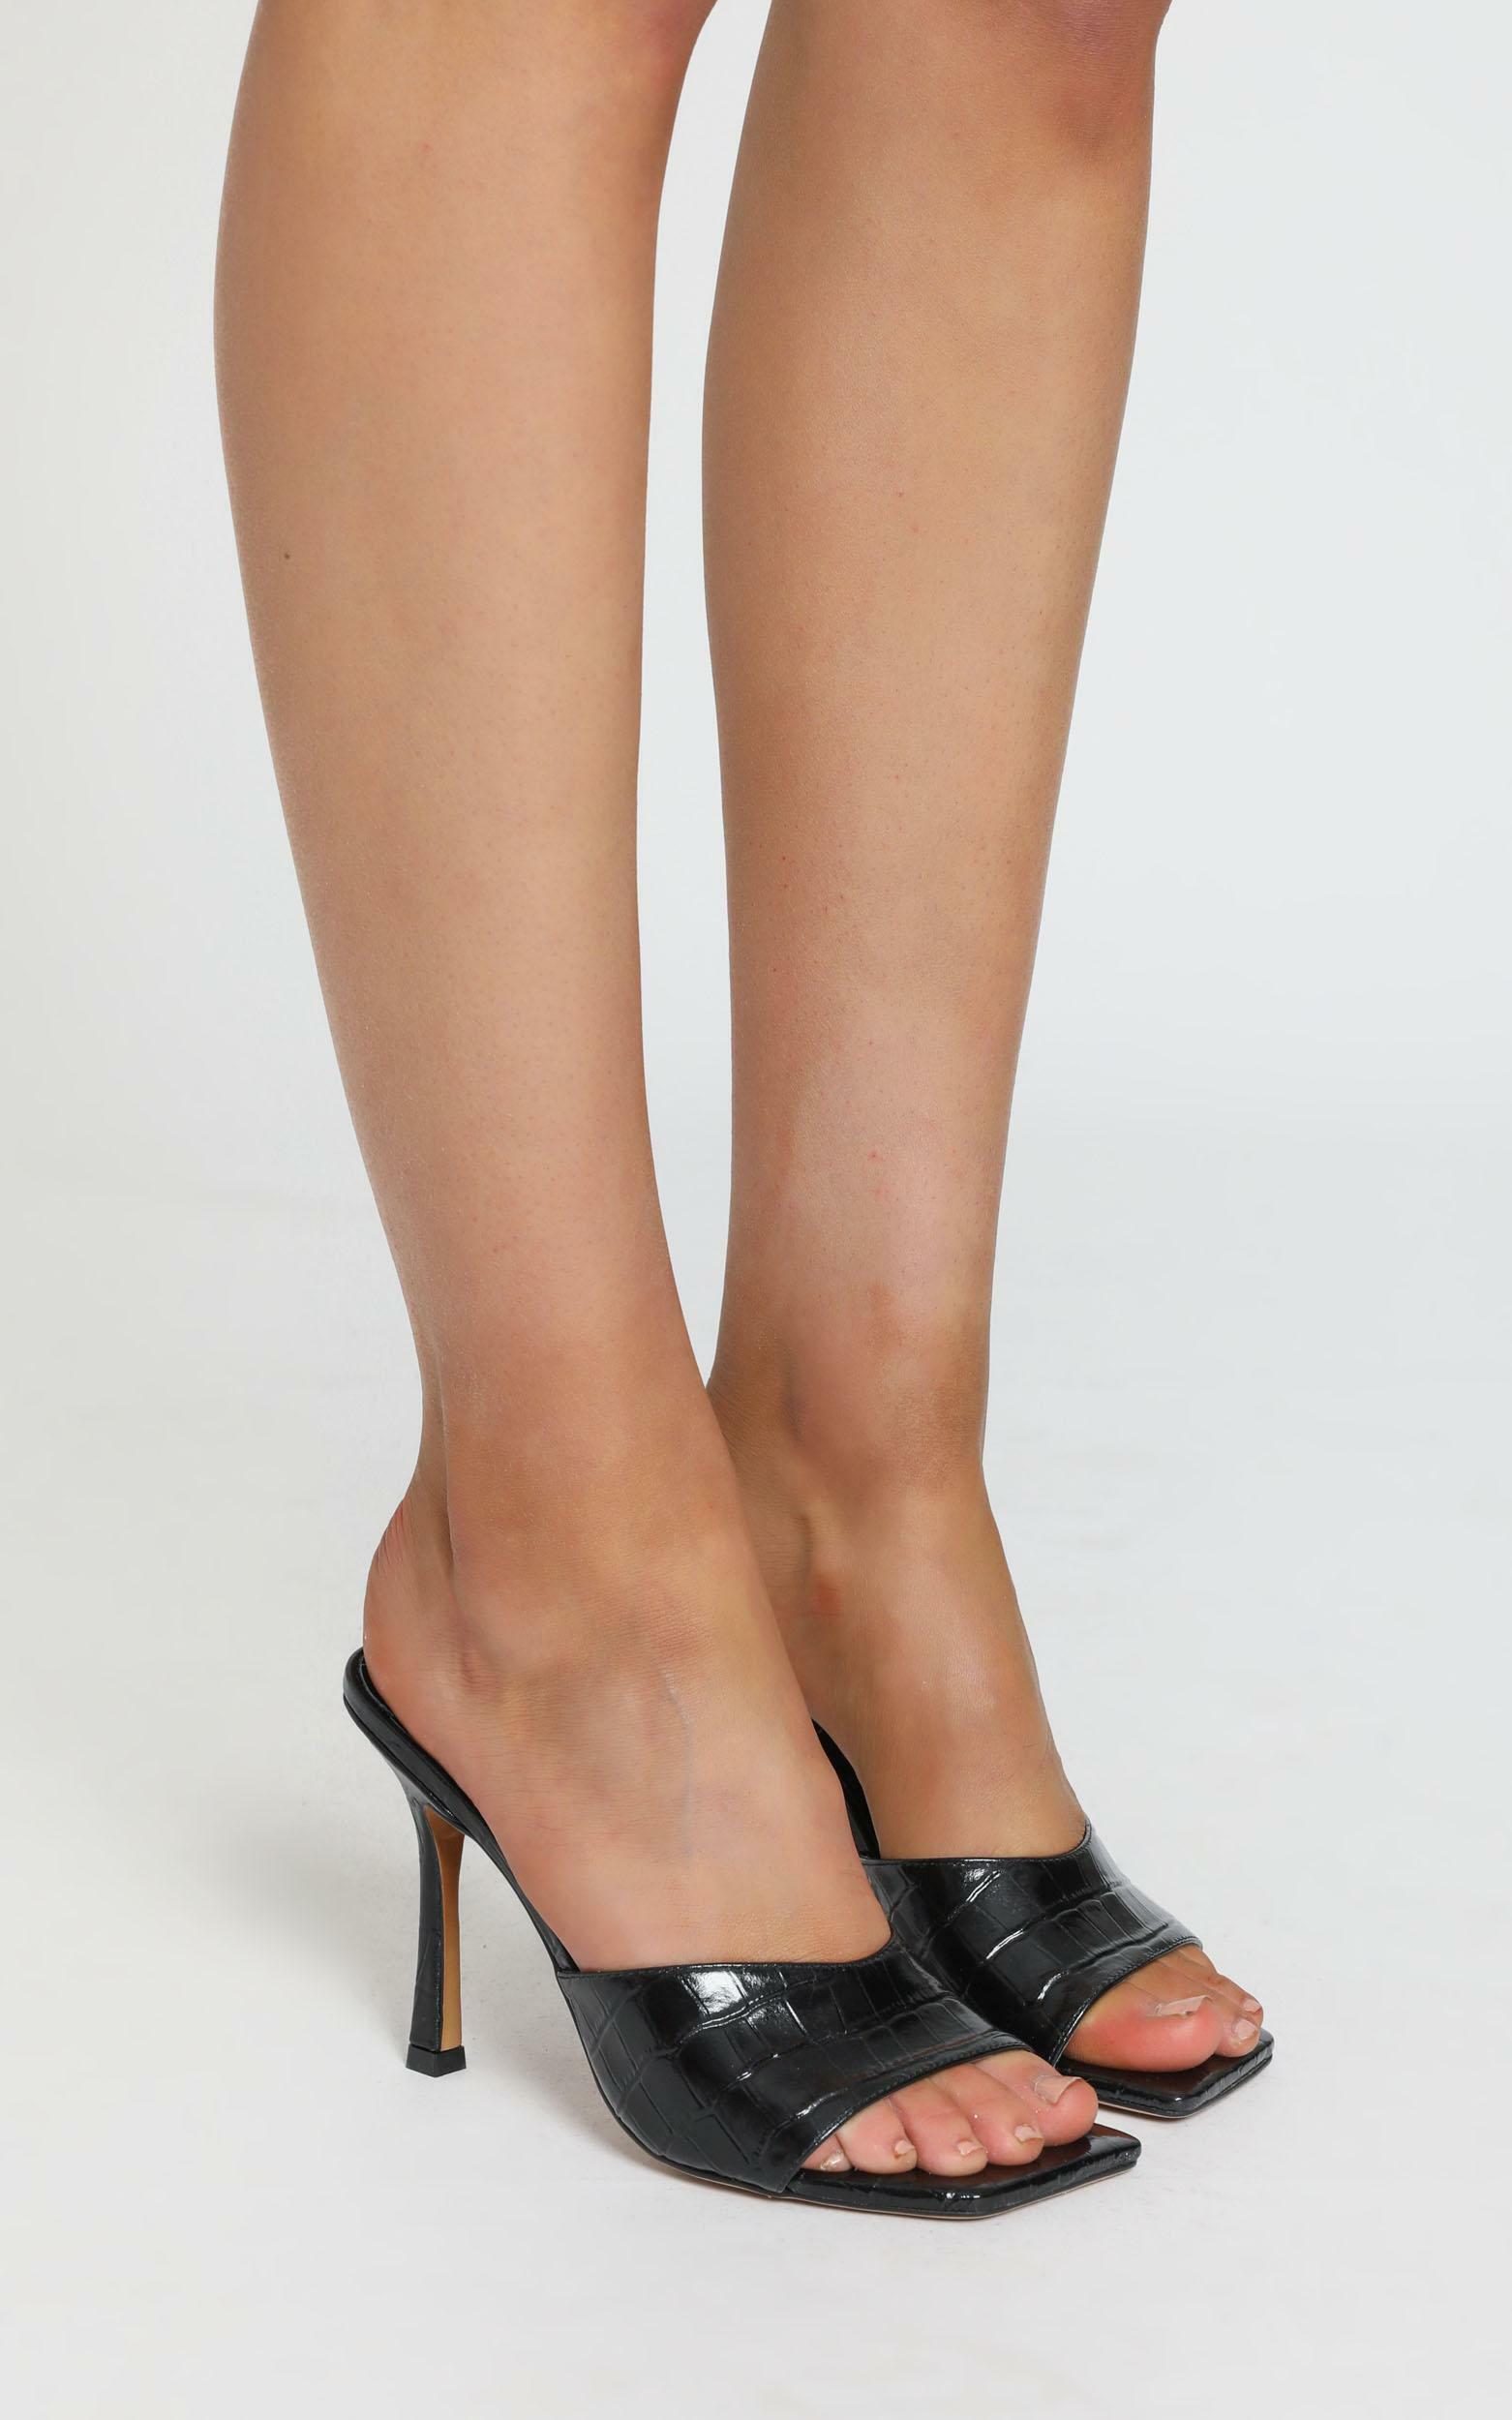 Tony Bianco - Bosco Heels in black croc - 5, Black, hi-res image number null